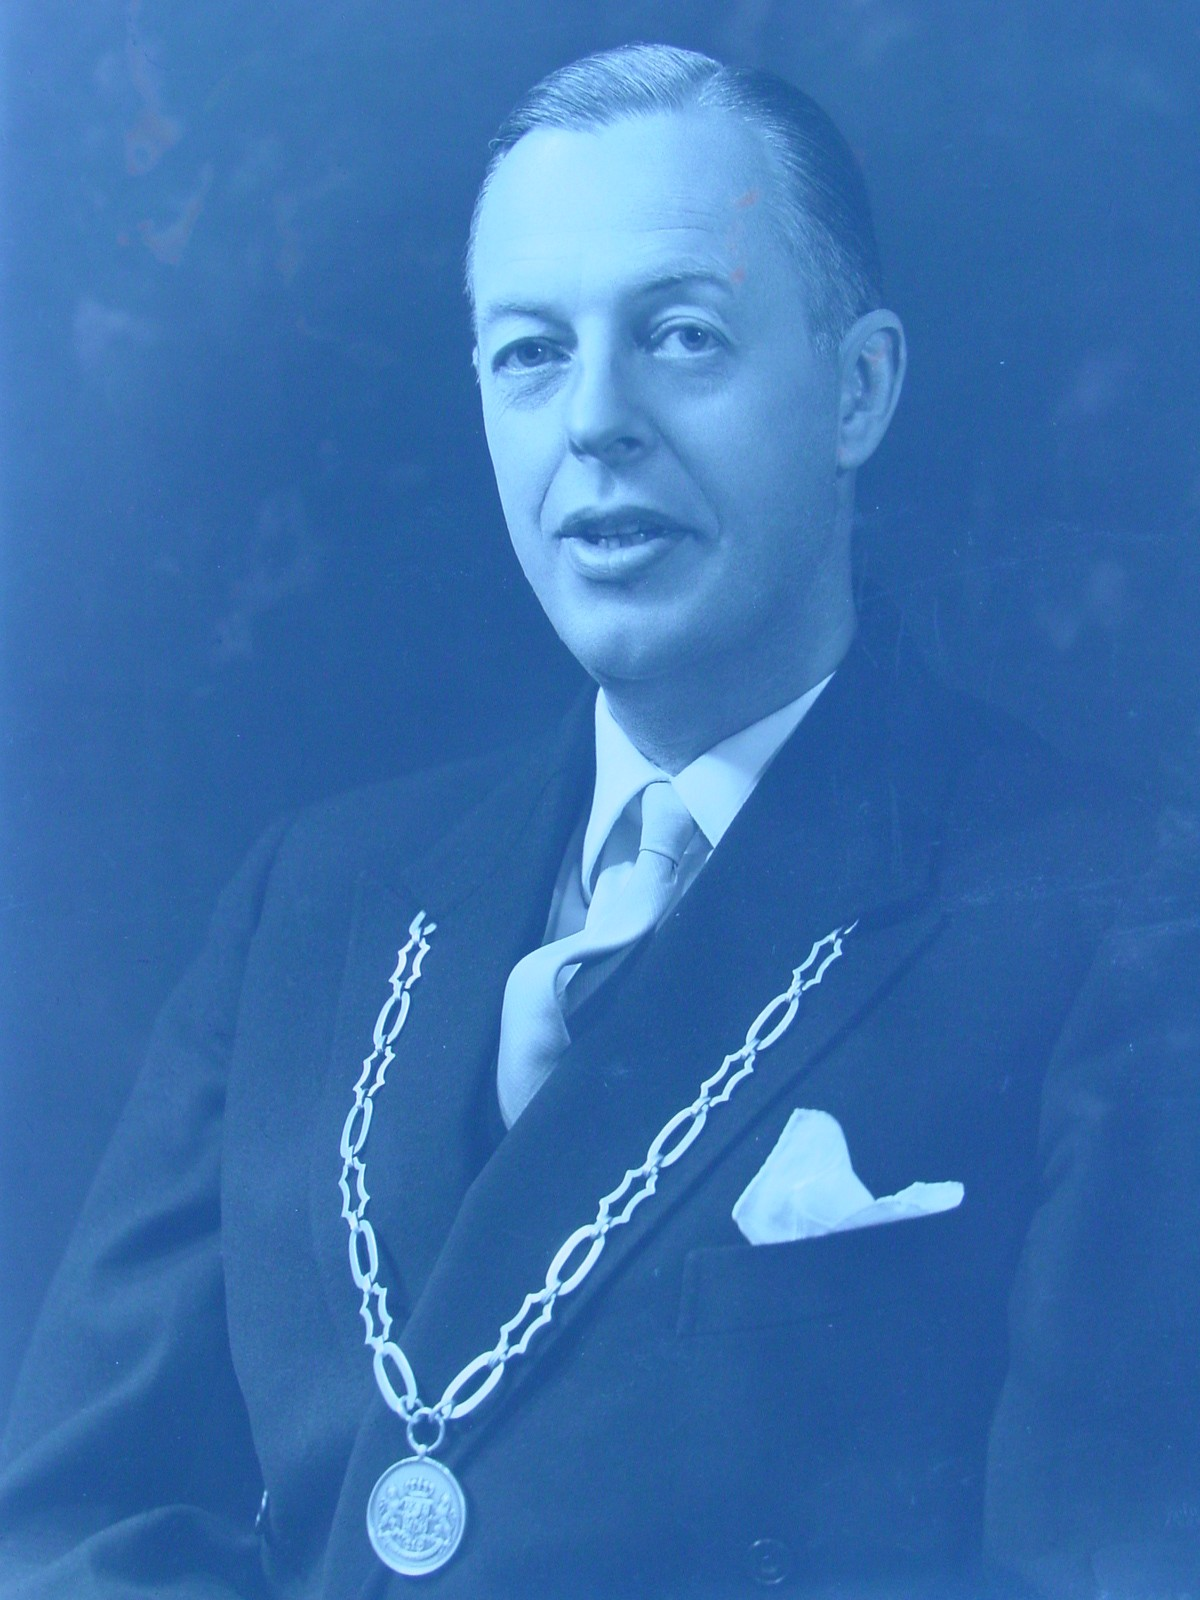 Burgemeester A. Feith